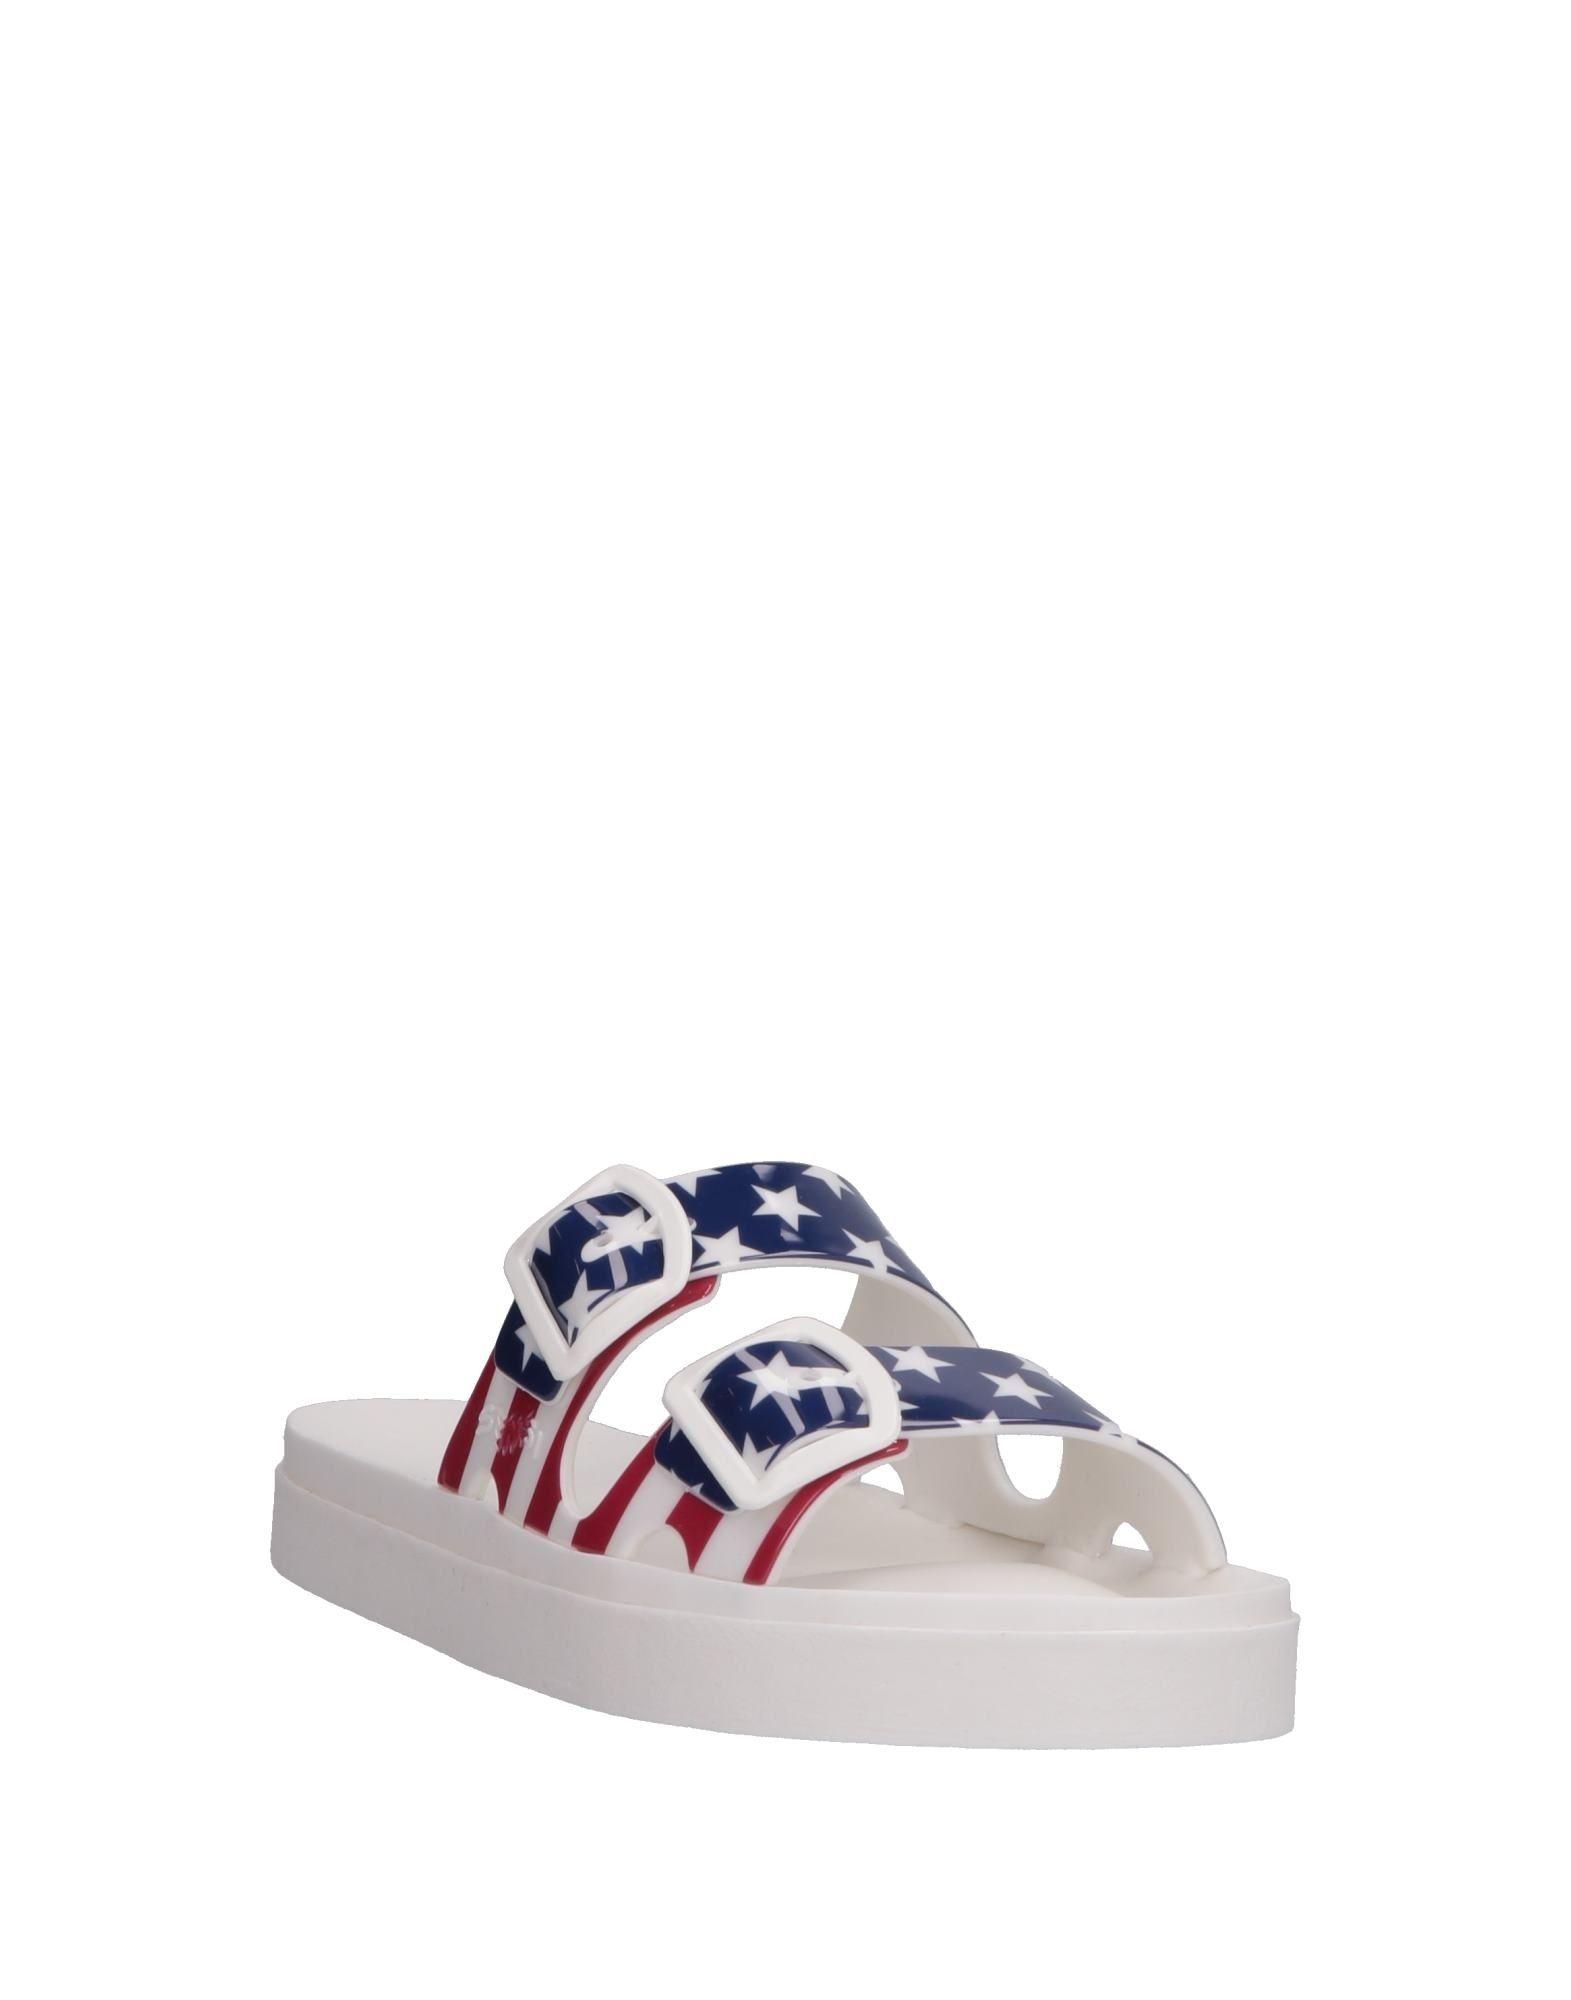 Sensi Sandals - Women Sensi Sandals online on    United Kingdom - 11577181VG ed456b